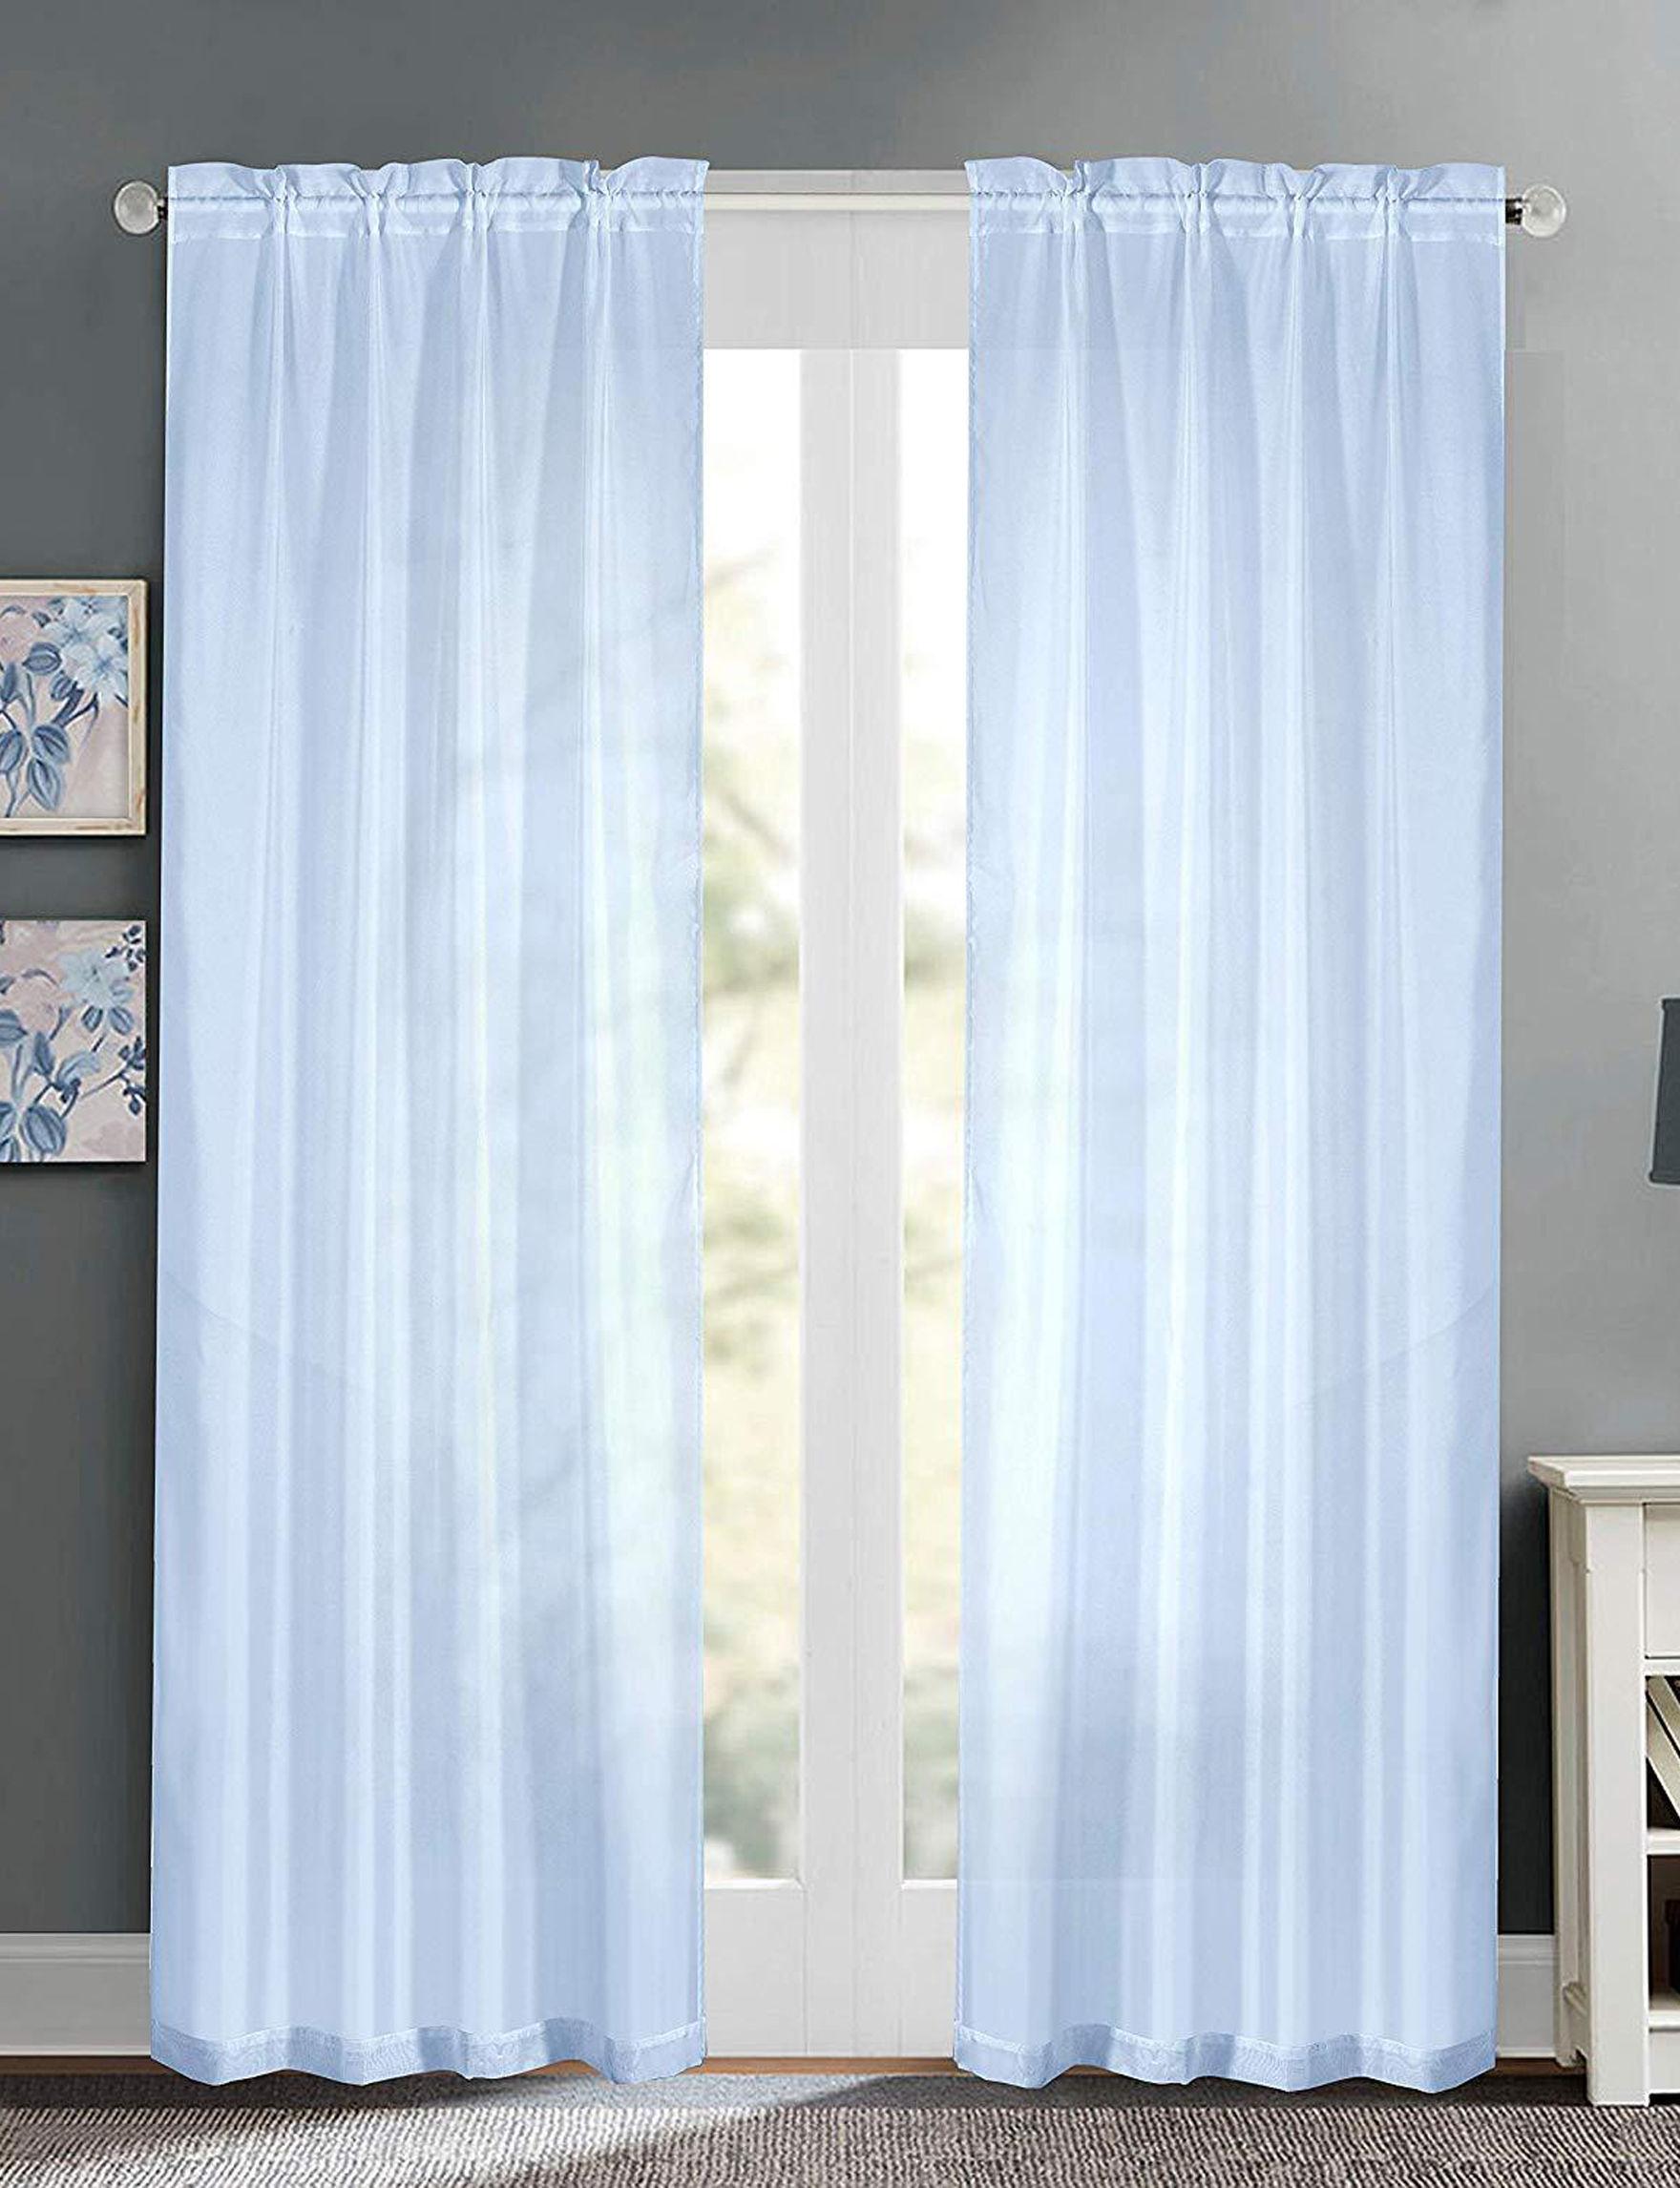 Casa Light Blue Curtains & Drapes Window Treatments